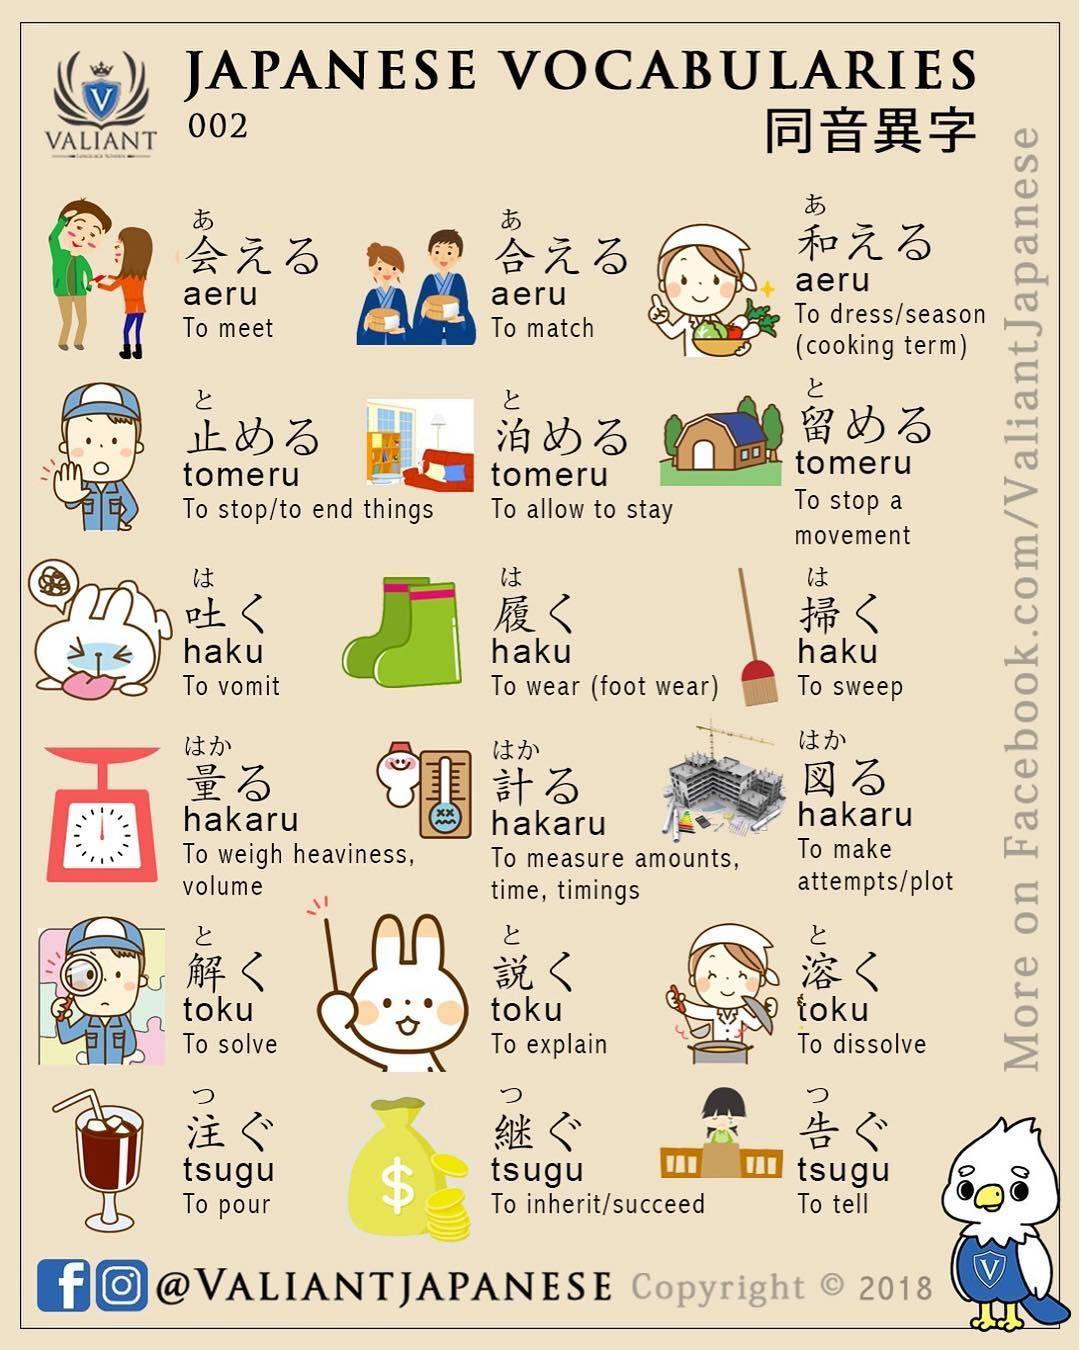 Valiant Language School Valiantjapanese Instagram